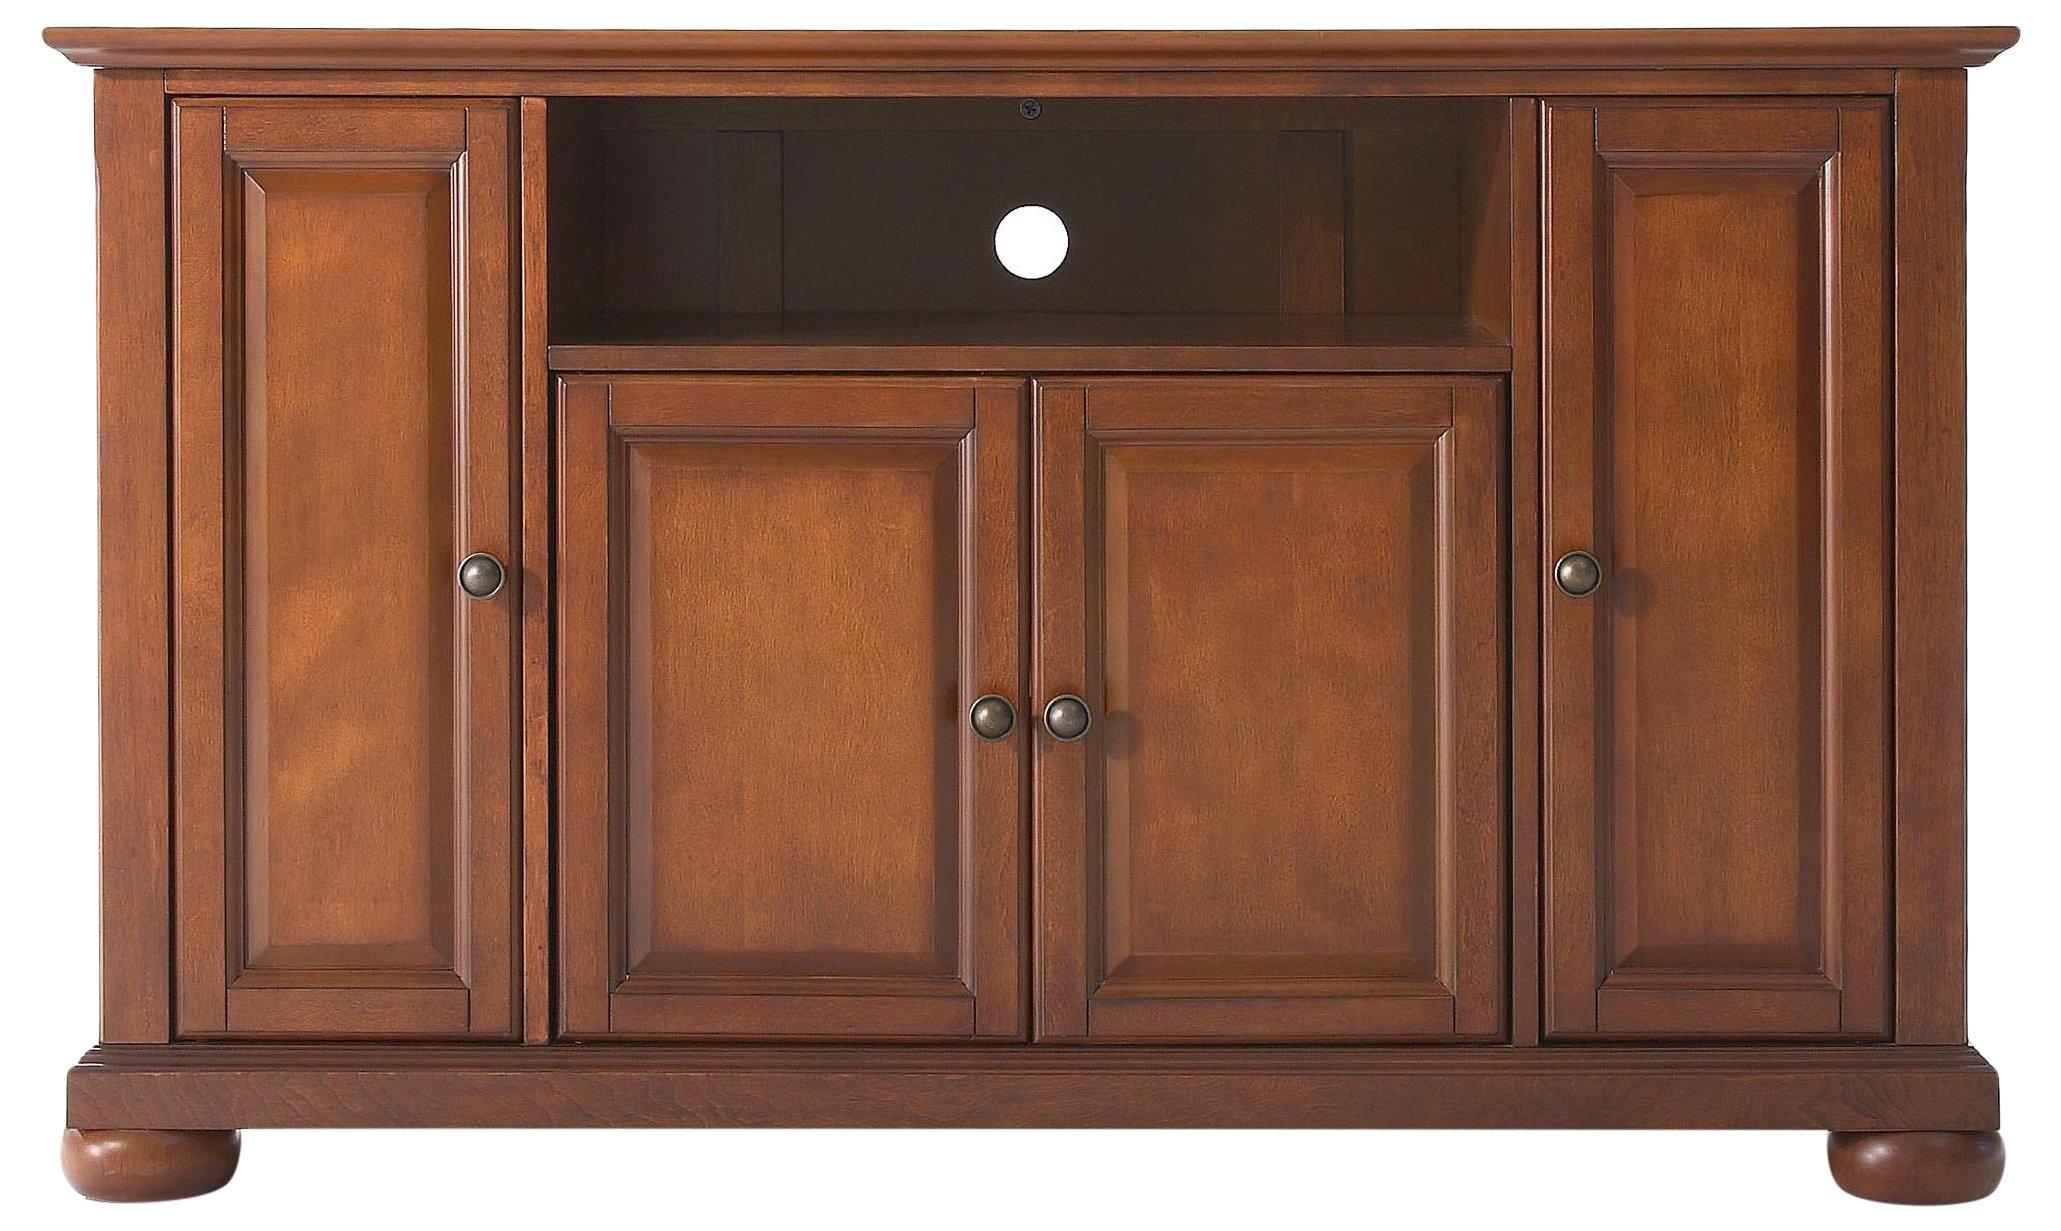 Crosley Furniture Alexandria 48-inch TV Stand - Classic Cherry by Crosley Furniture